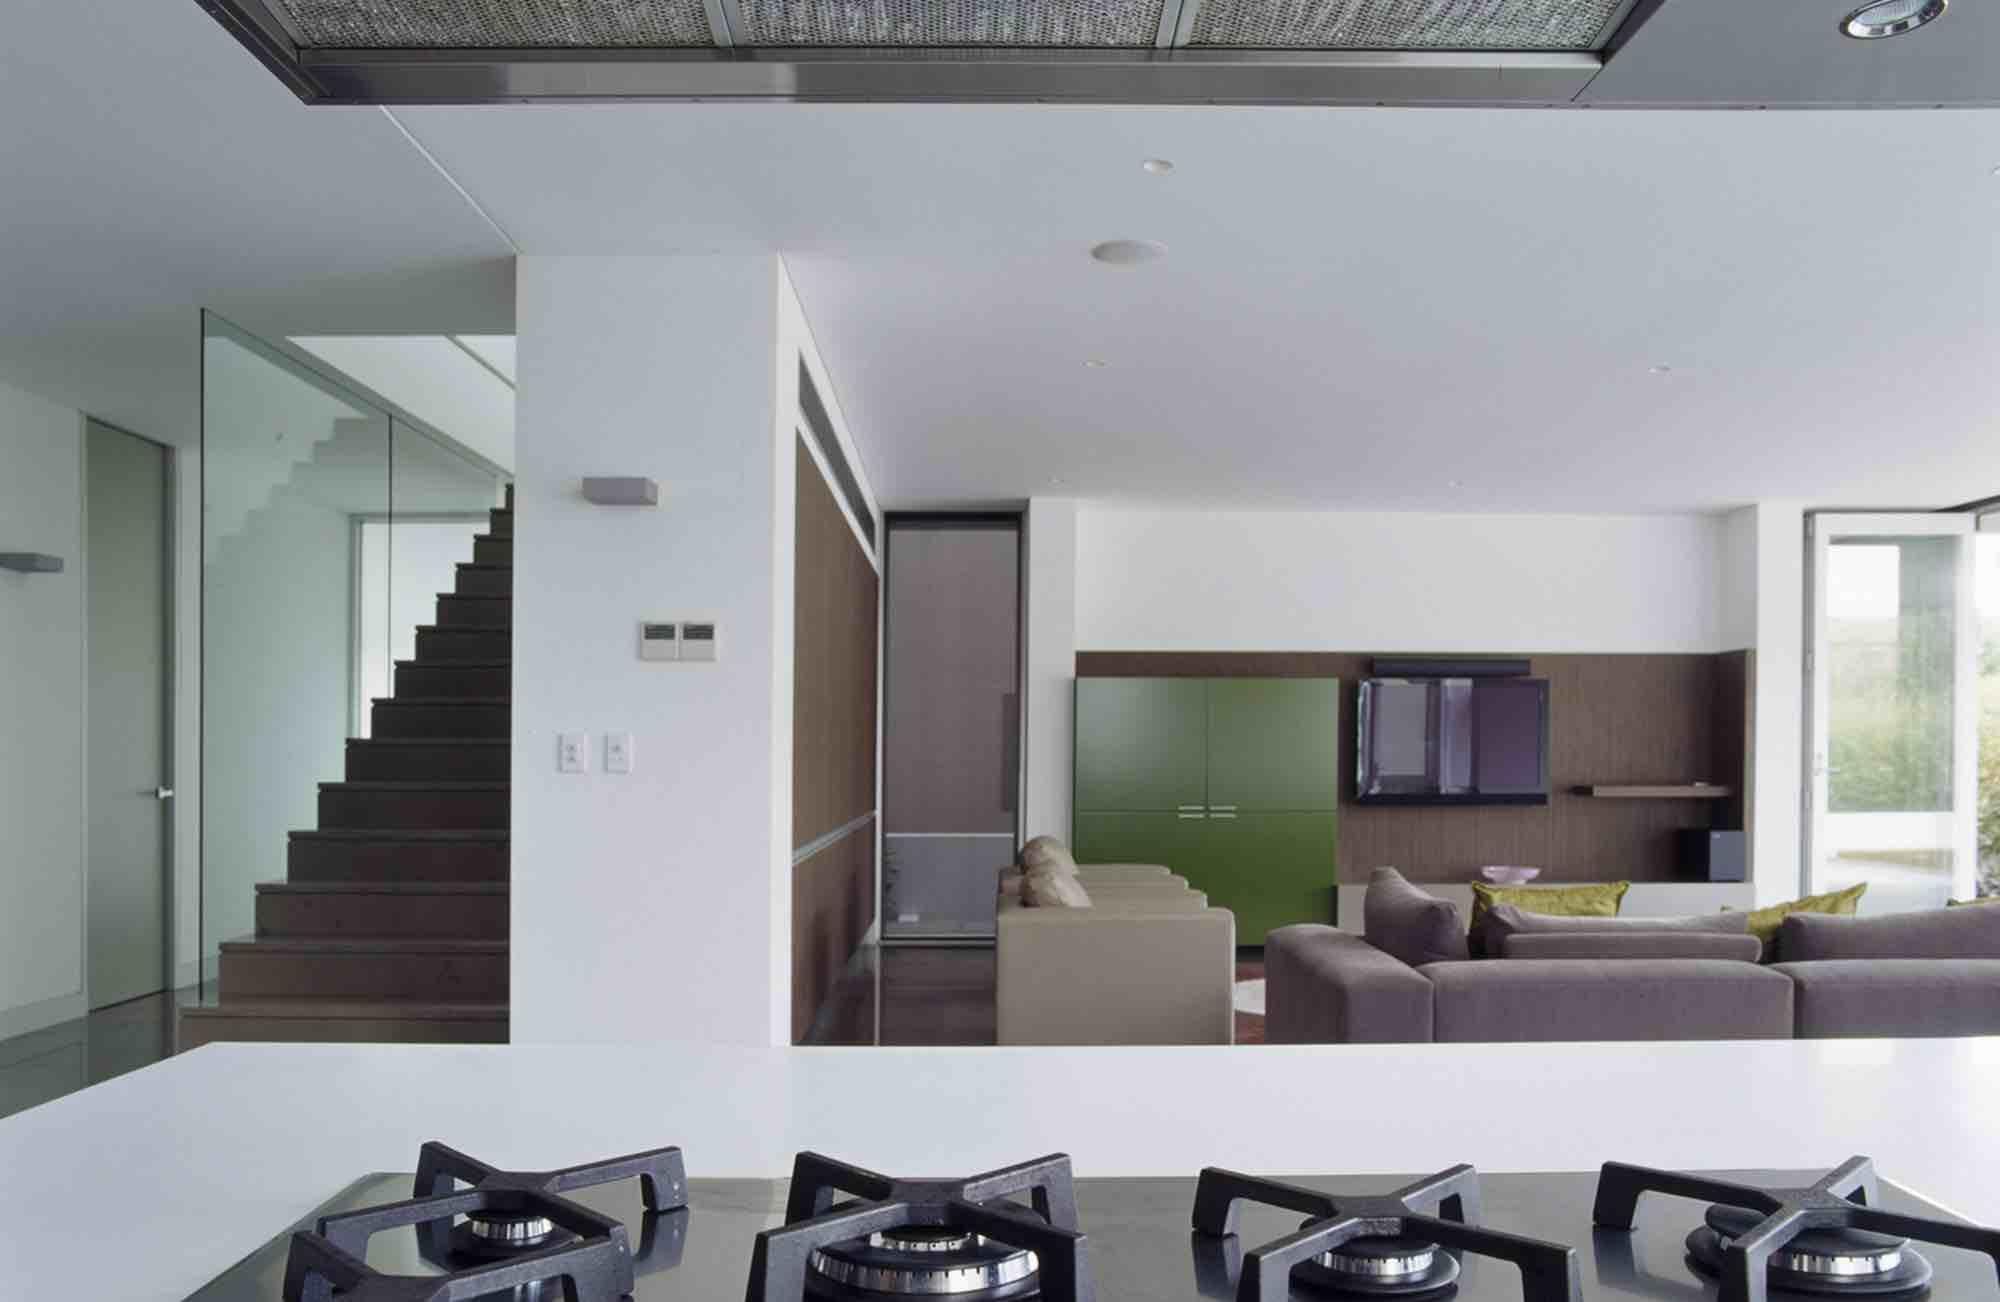 minosa-design-open-plan-high-ceiling-void-large-dinning-table-corian-benchtop-minosa-kitchen-gilda-barazza-cooktop-02